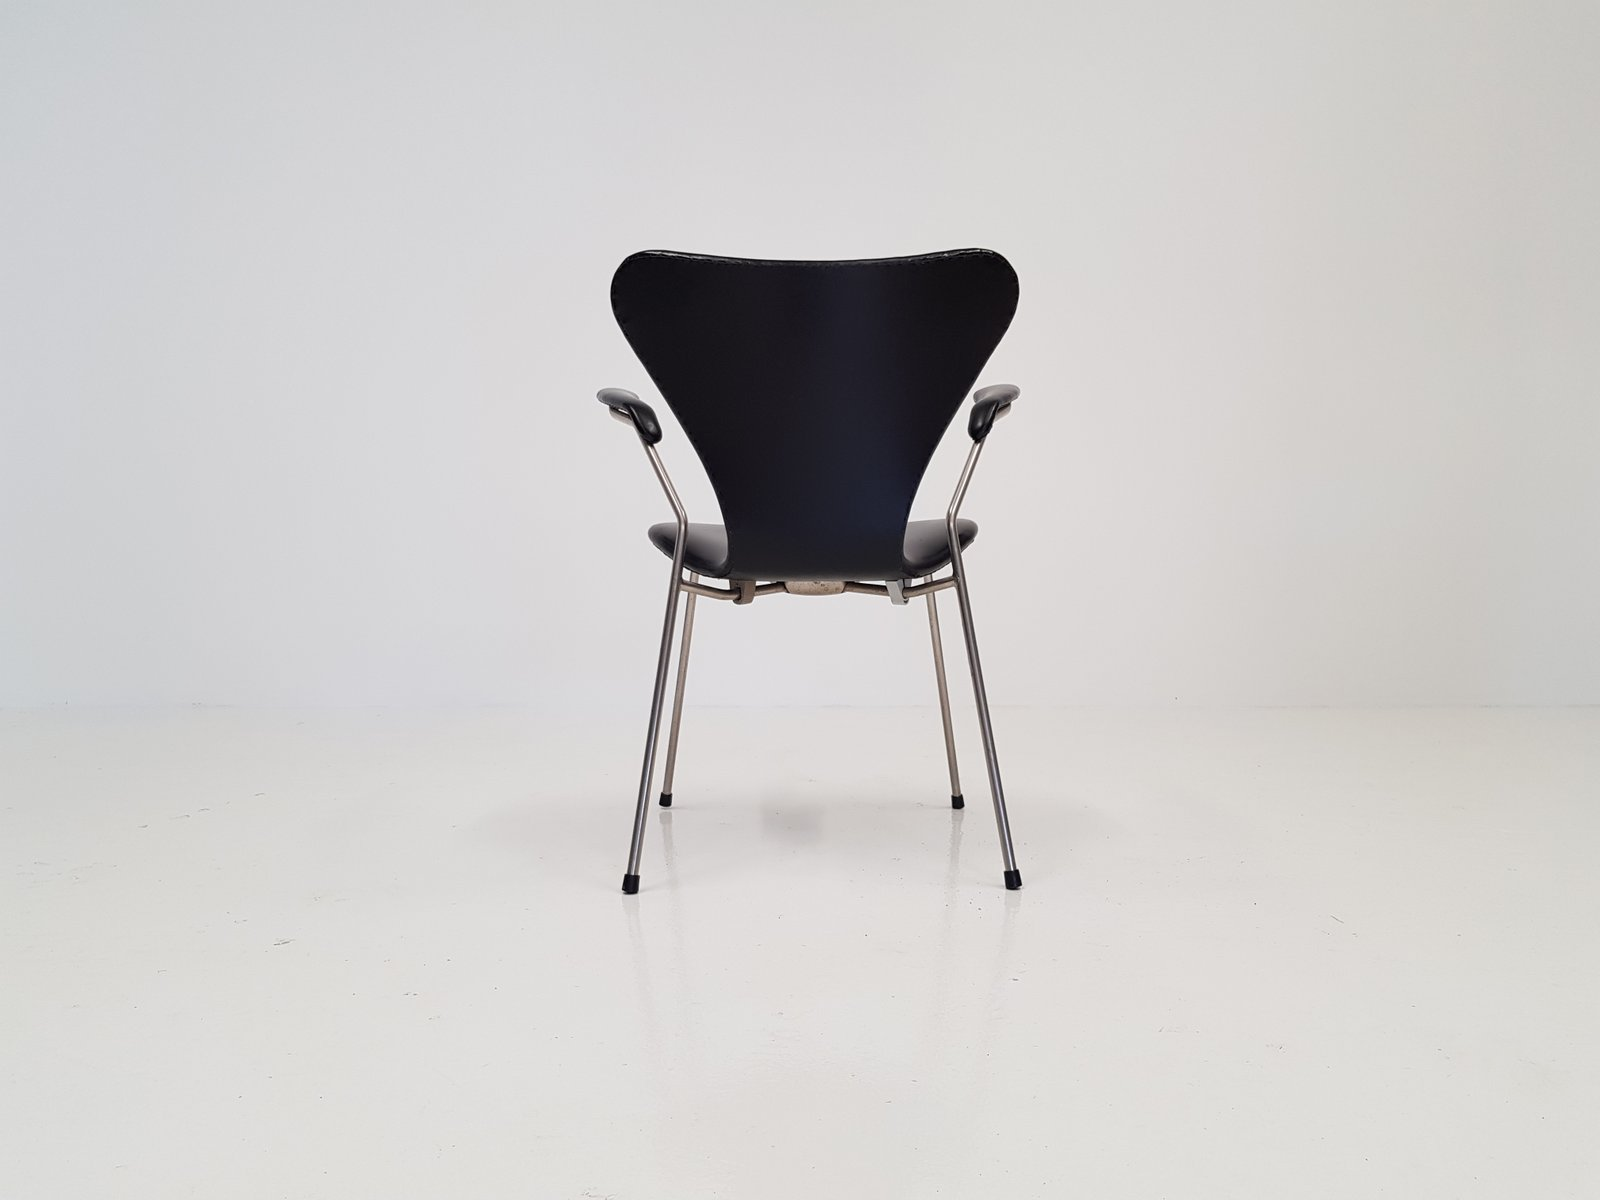 Modell 3207 Serie 7 Armlehnstuhl In Kunstleder Von Arne Jacobsen Für